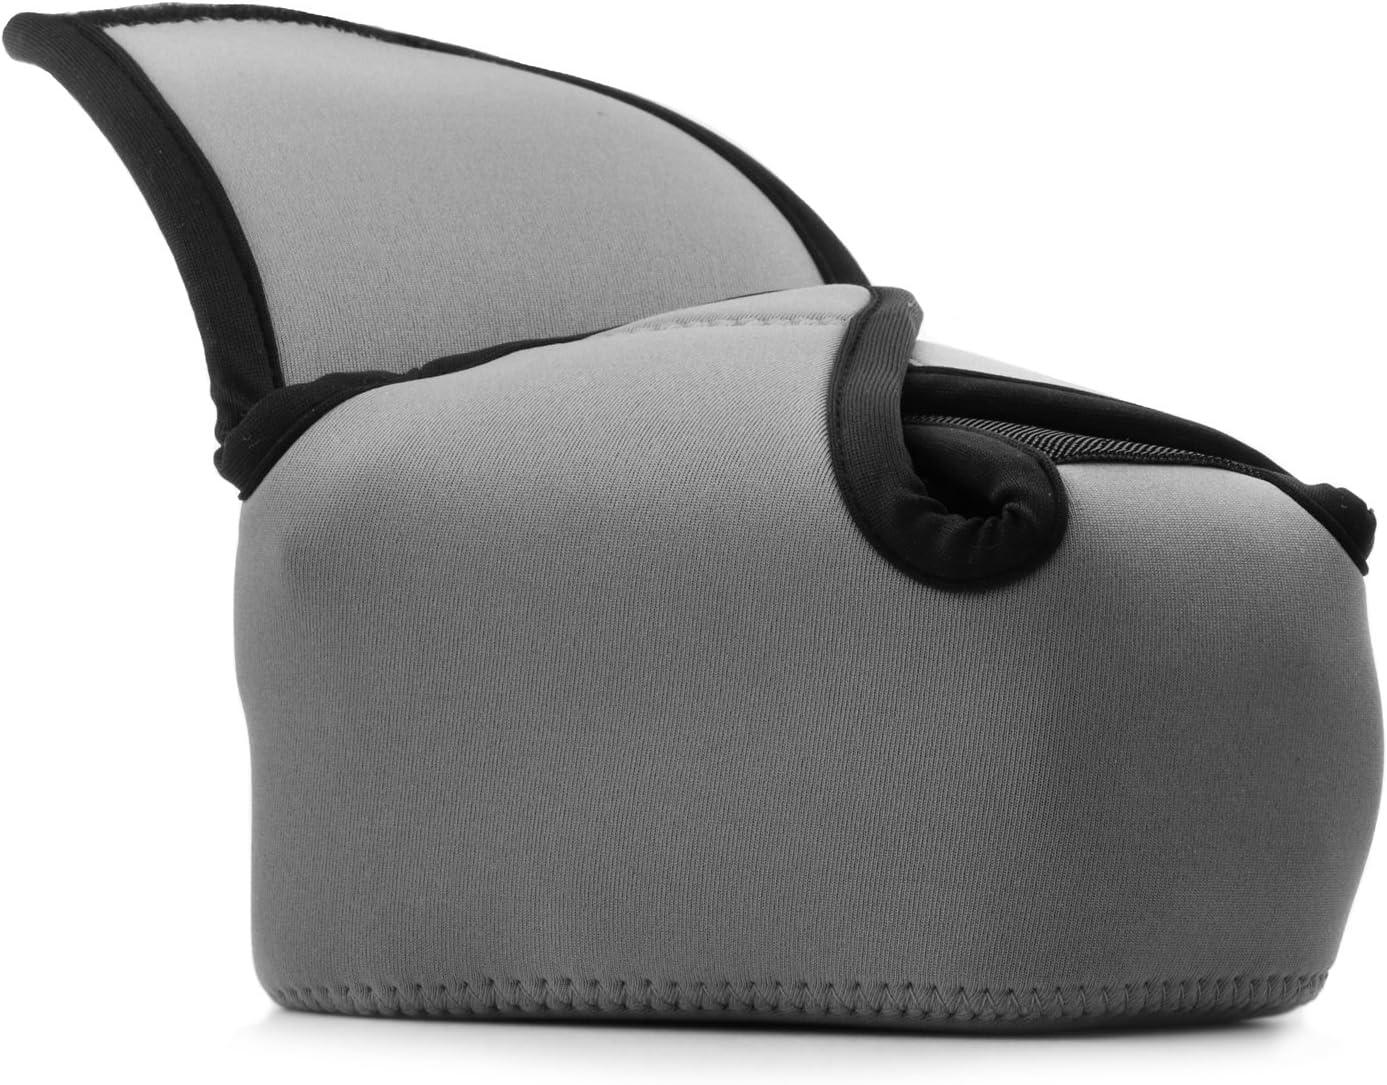 Blue MegaGear MG1335 Ultra Light Neoprene Case with Carabiner for Fujifilm X-E3 Camera